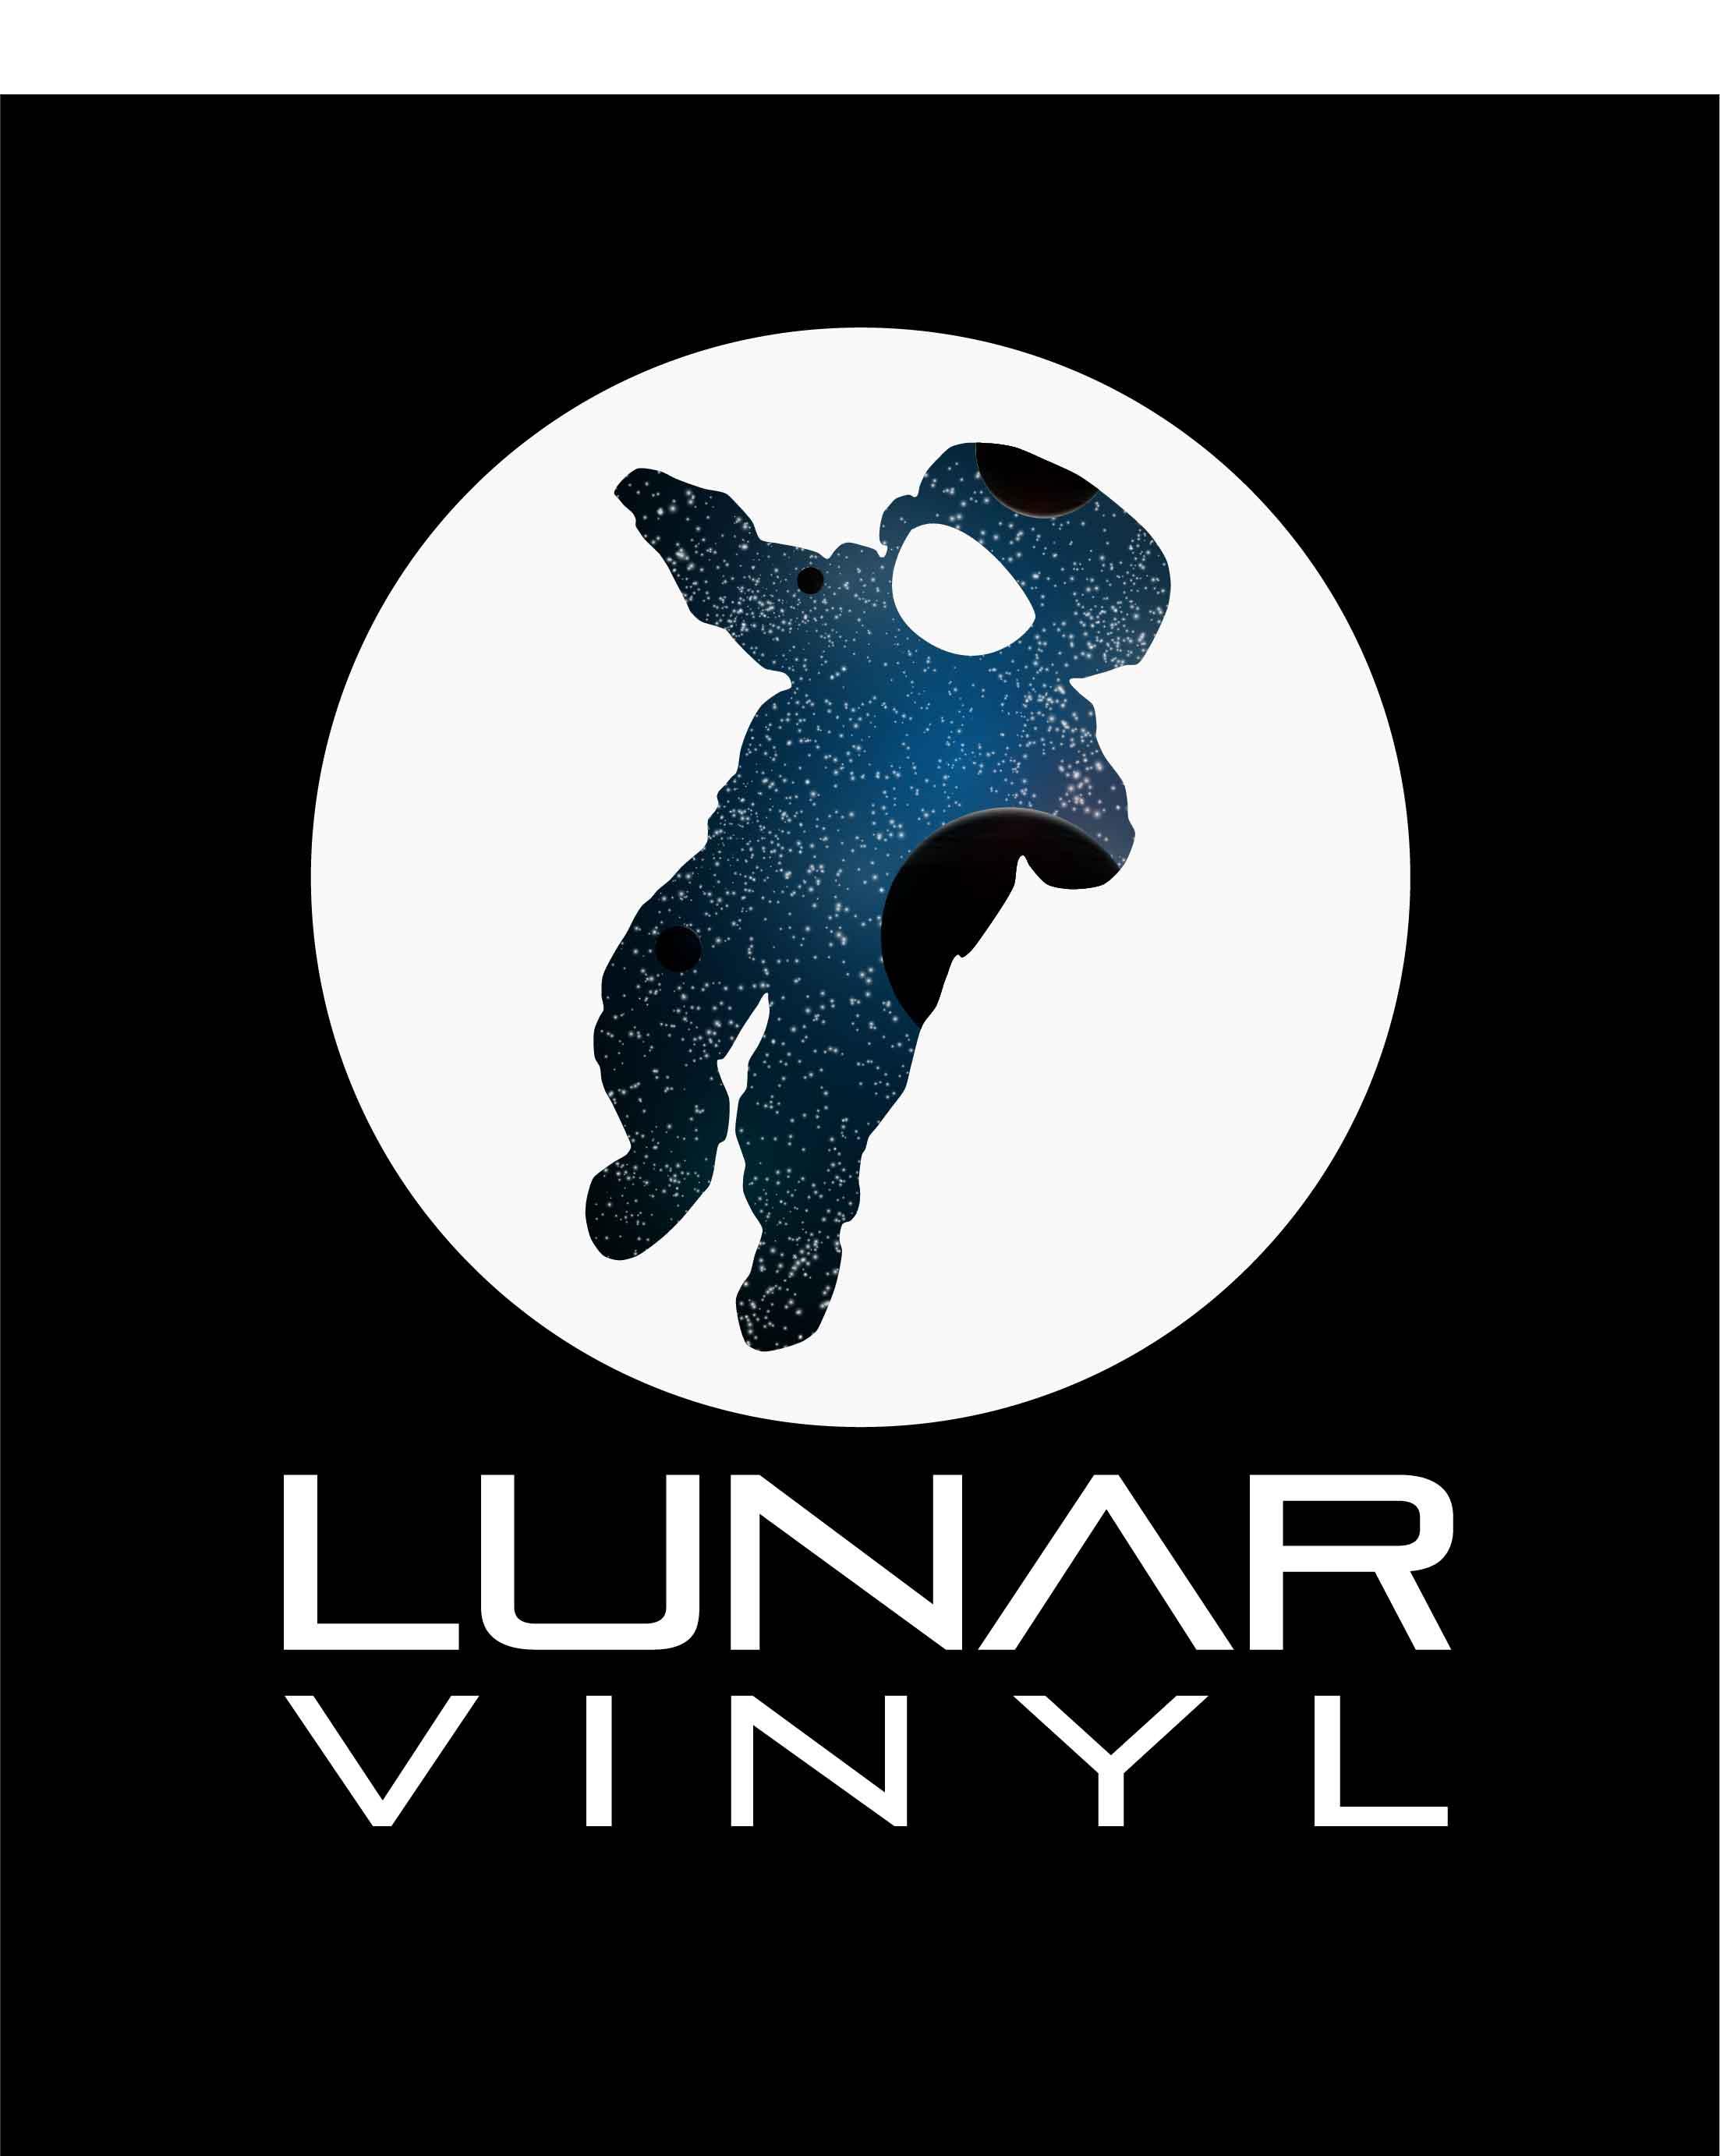 Lunar Vinyl Logo